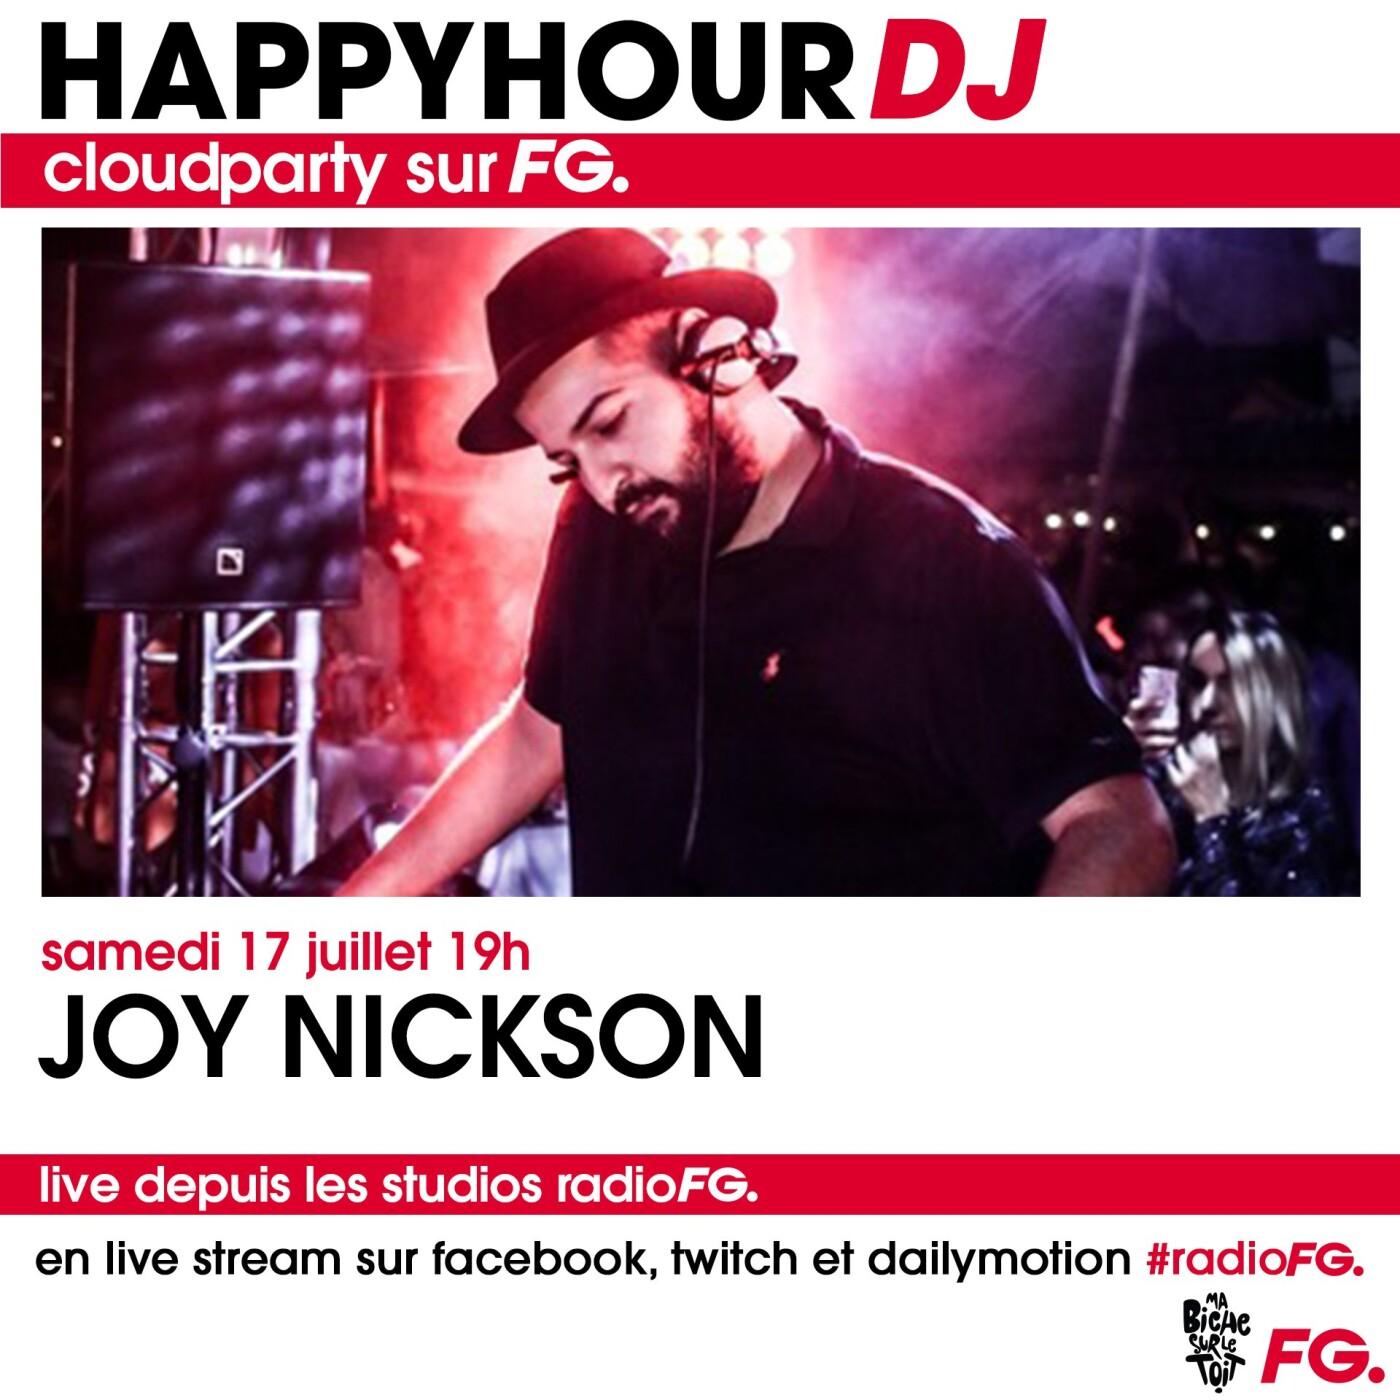 HAPPY HOUR DJ : JOY NICKSON